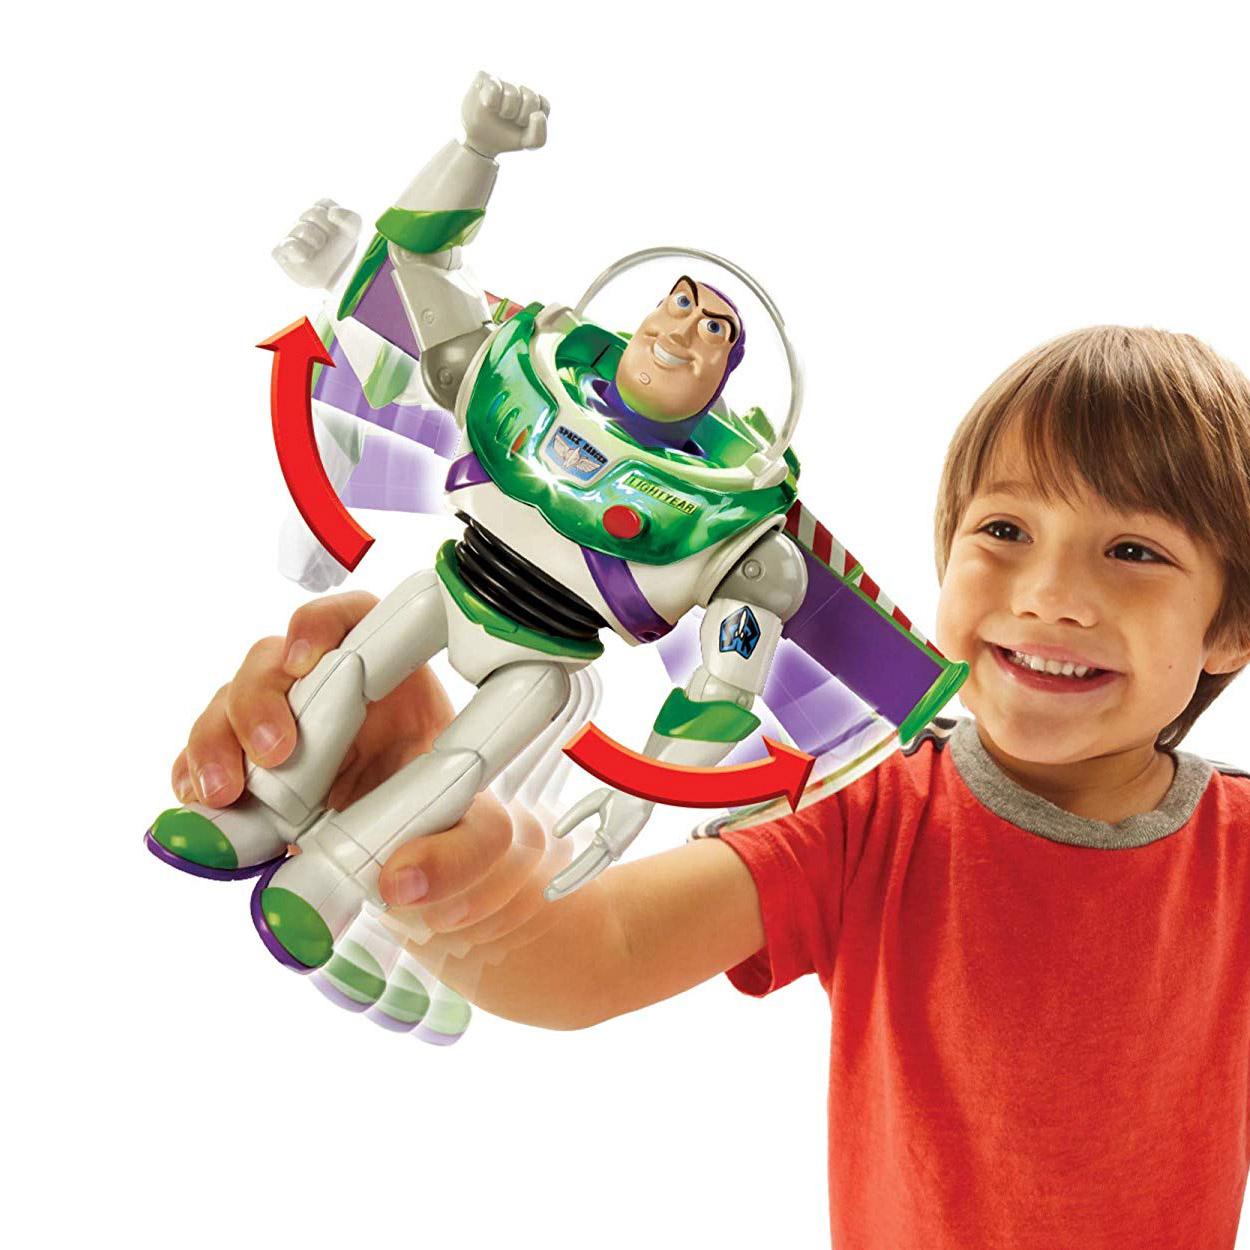 toy-story-figurka-podvignaya-duke-caboom-kupit